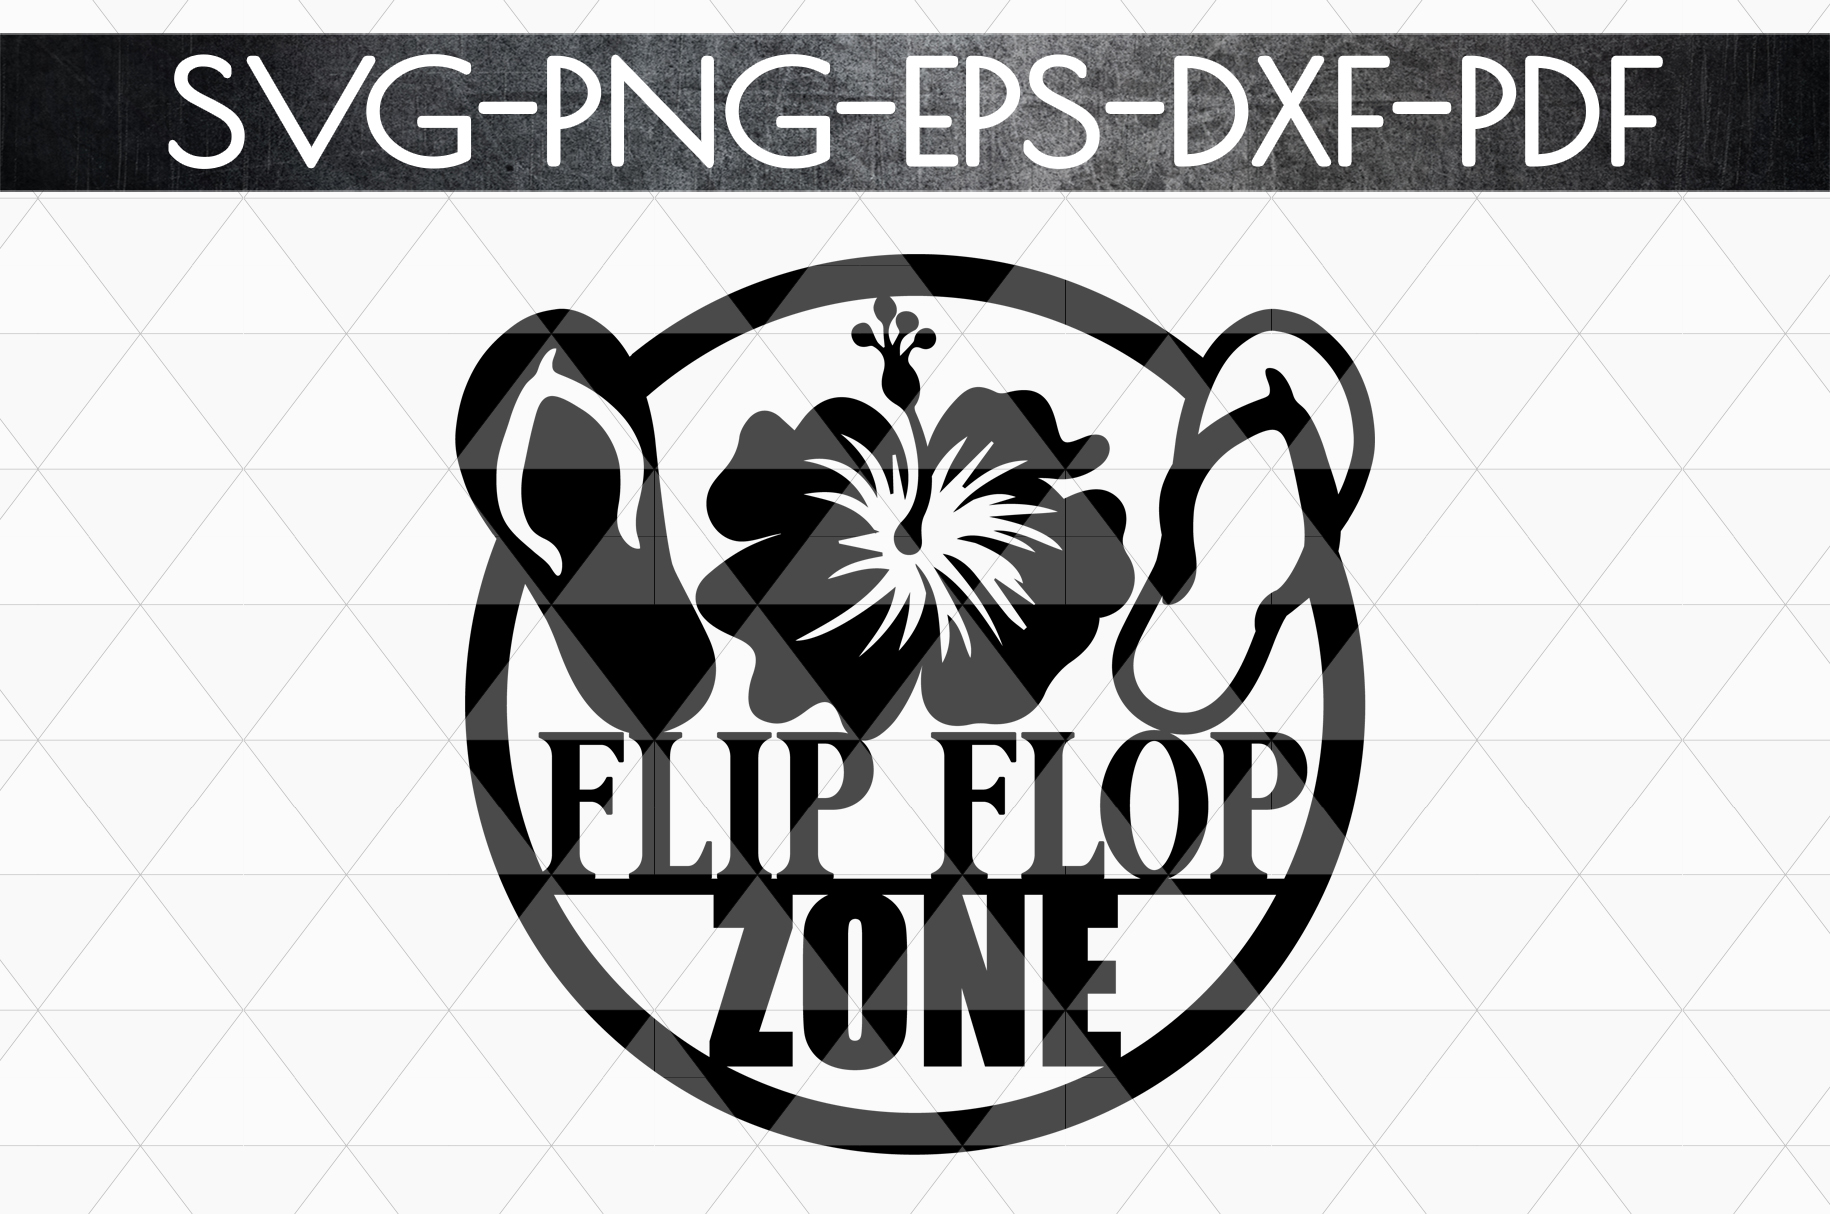 Flip Flop Zone Papercut Template, Beach House Decor SVG, DXF example image 4